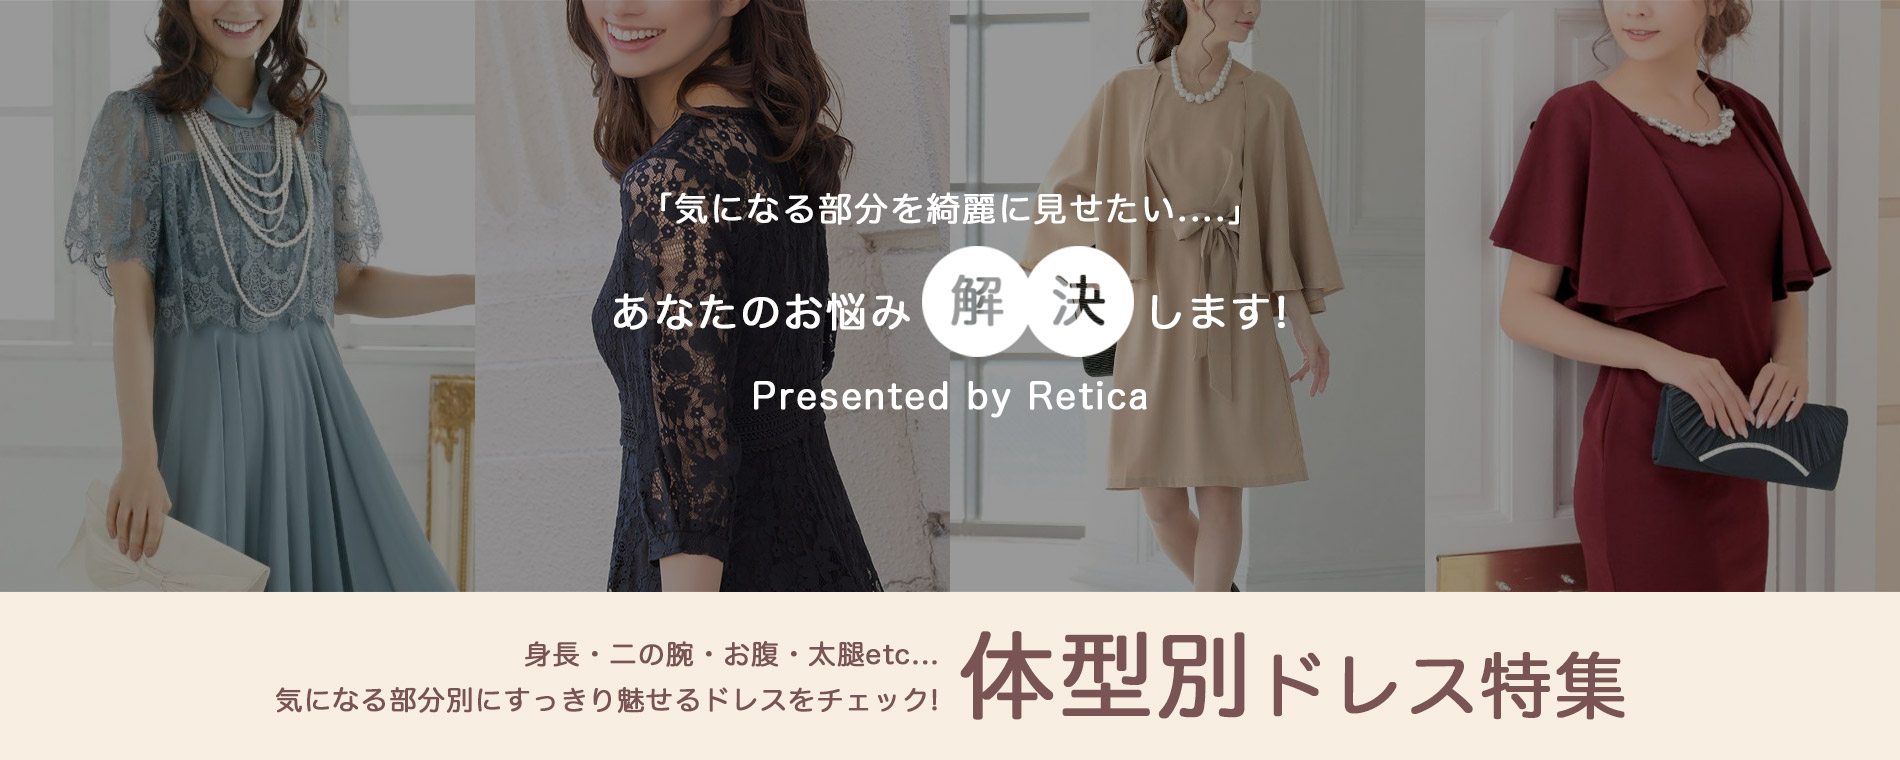 Retica(レティカ) お悩み解消!体系別ドレス特集